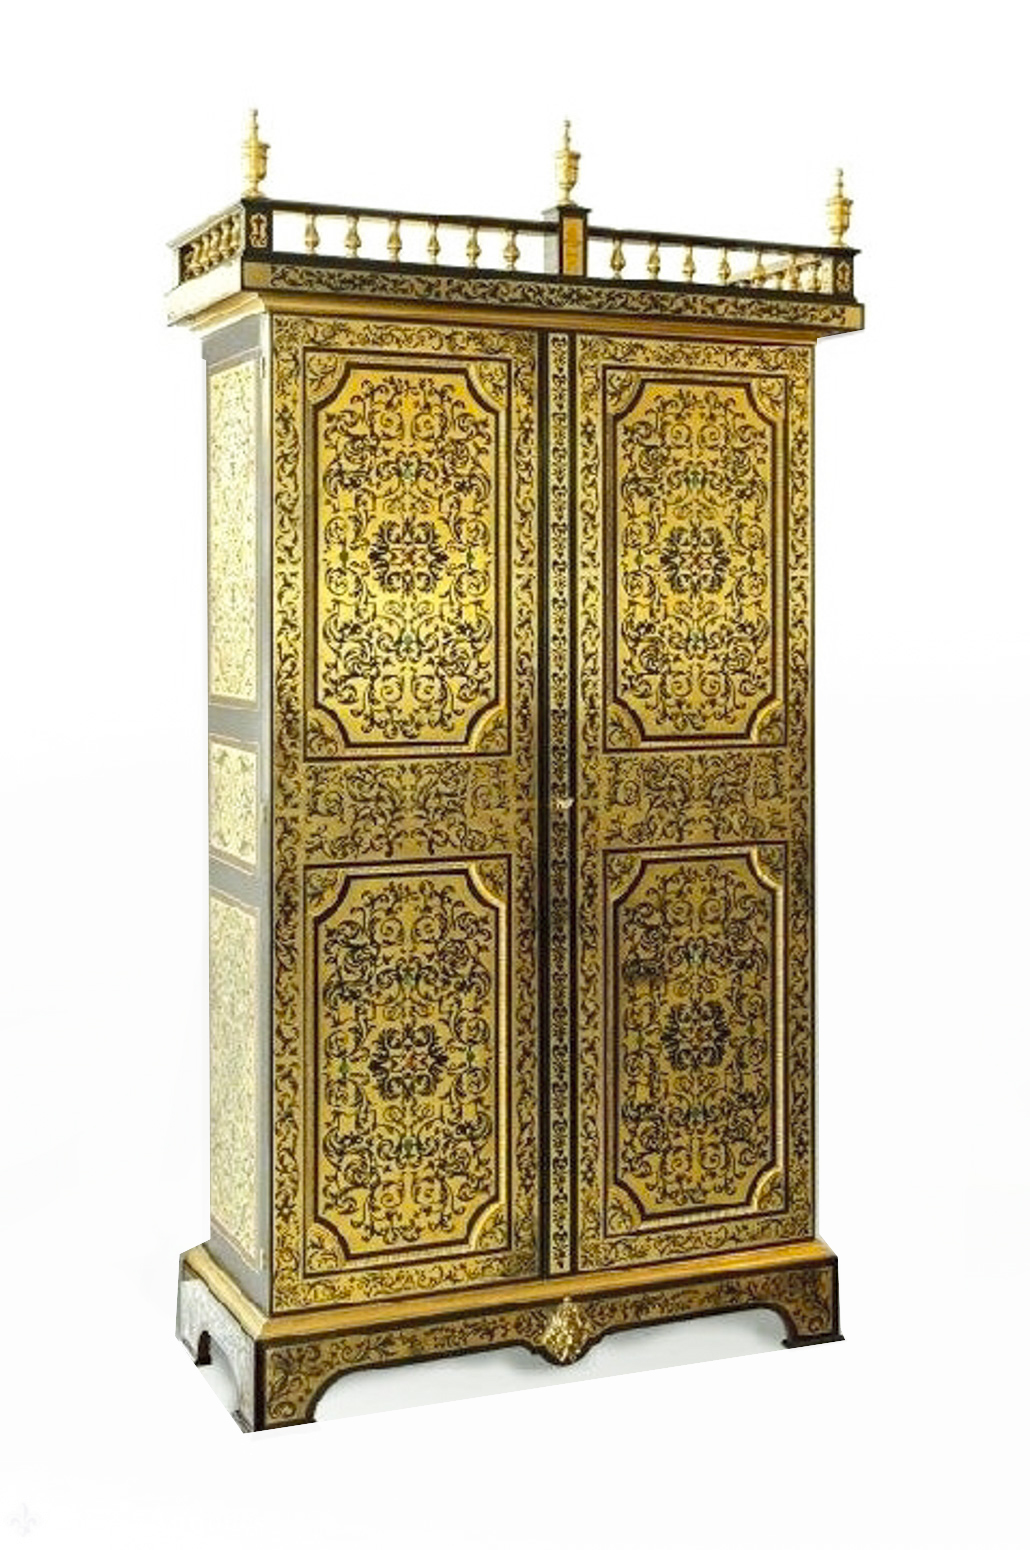 Antique French Cut Brass Inlaid Cabinet Wardrobe C 1910